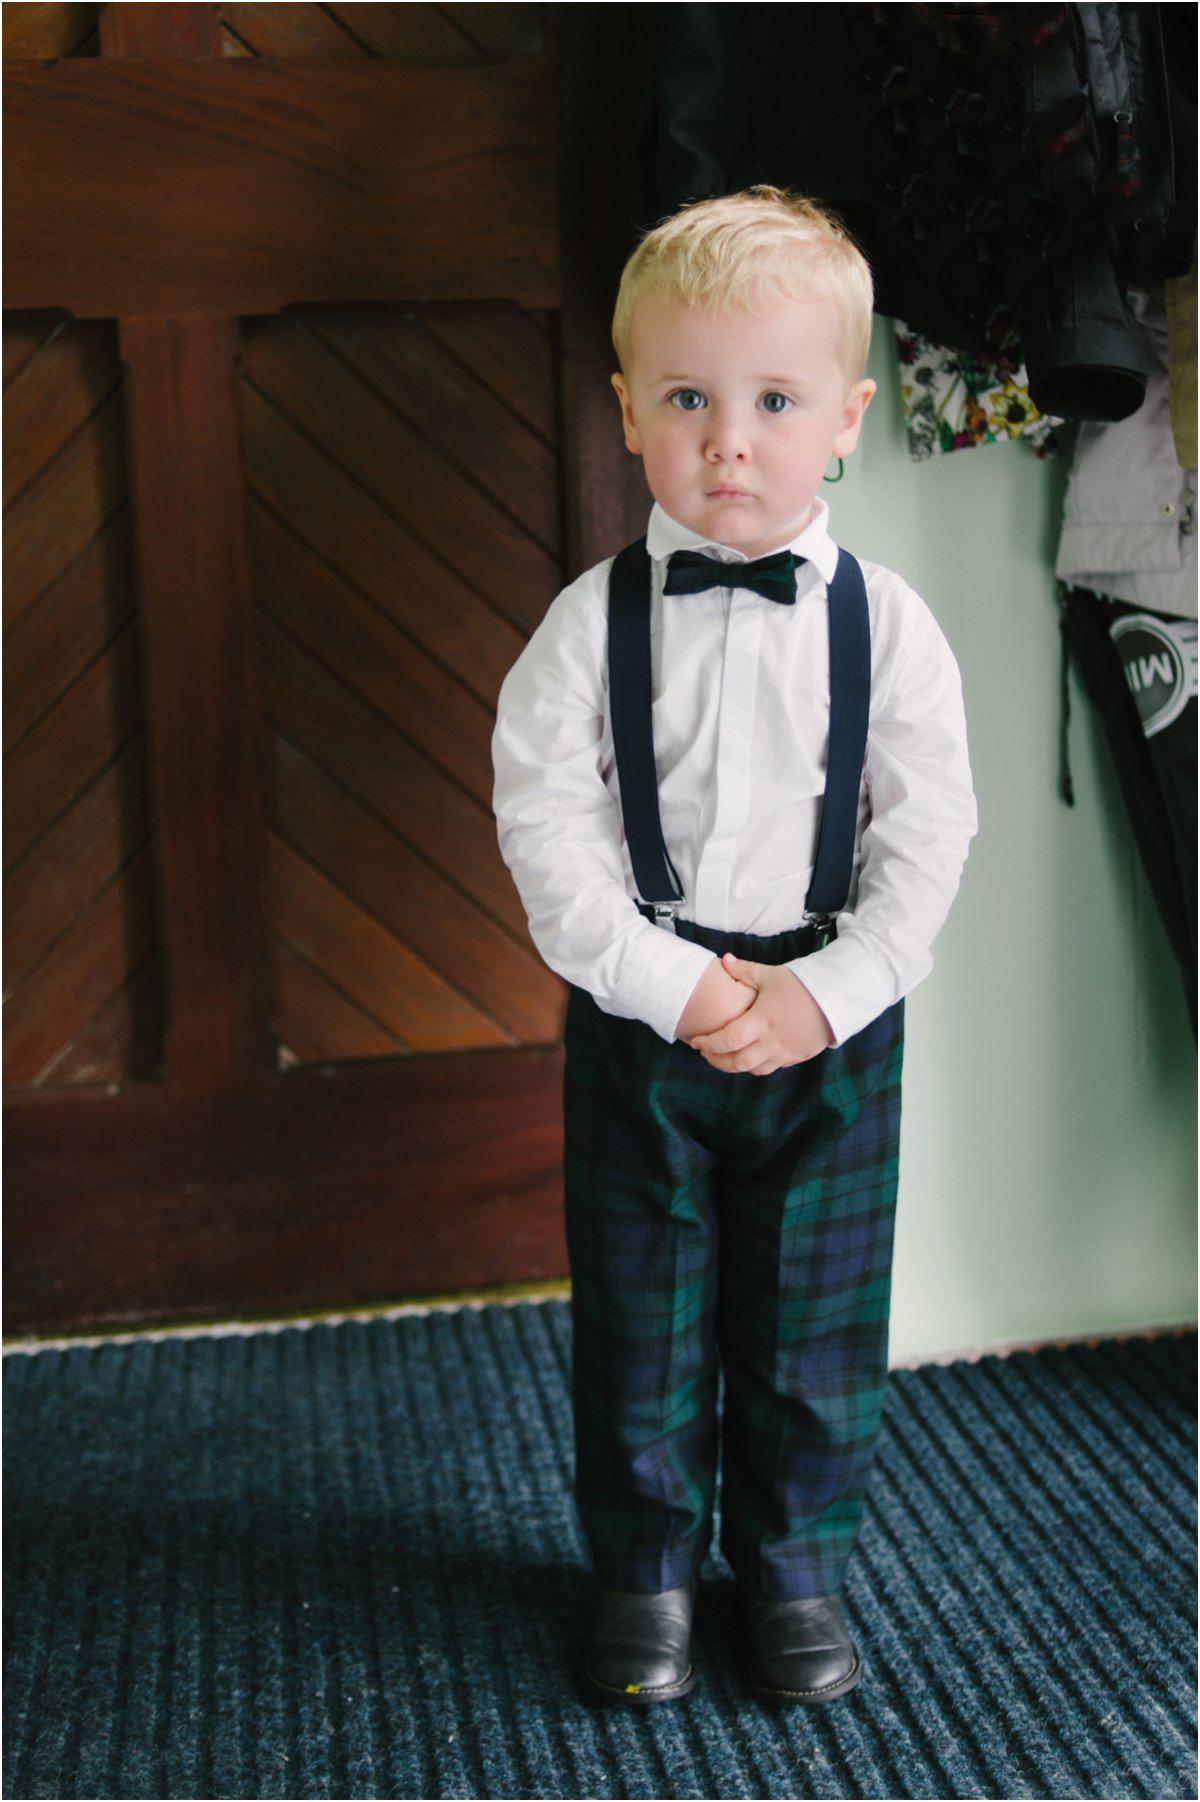 Crofts & Kowalczyk Best Wedding Photography Scotland Blogpost-113.jpg